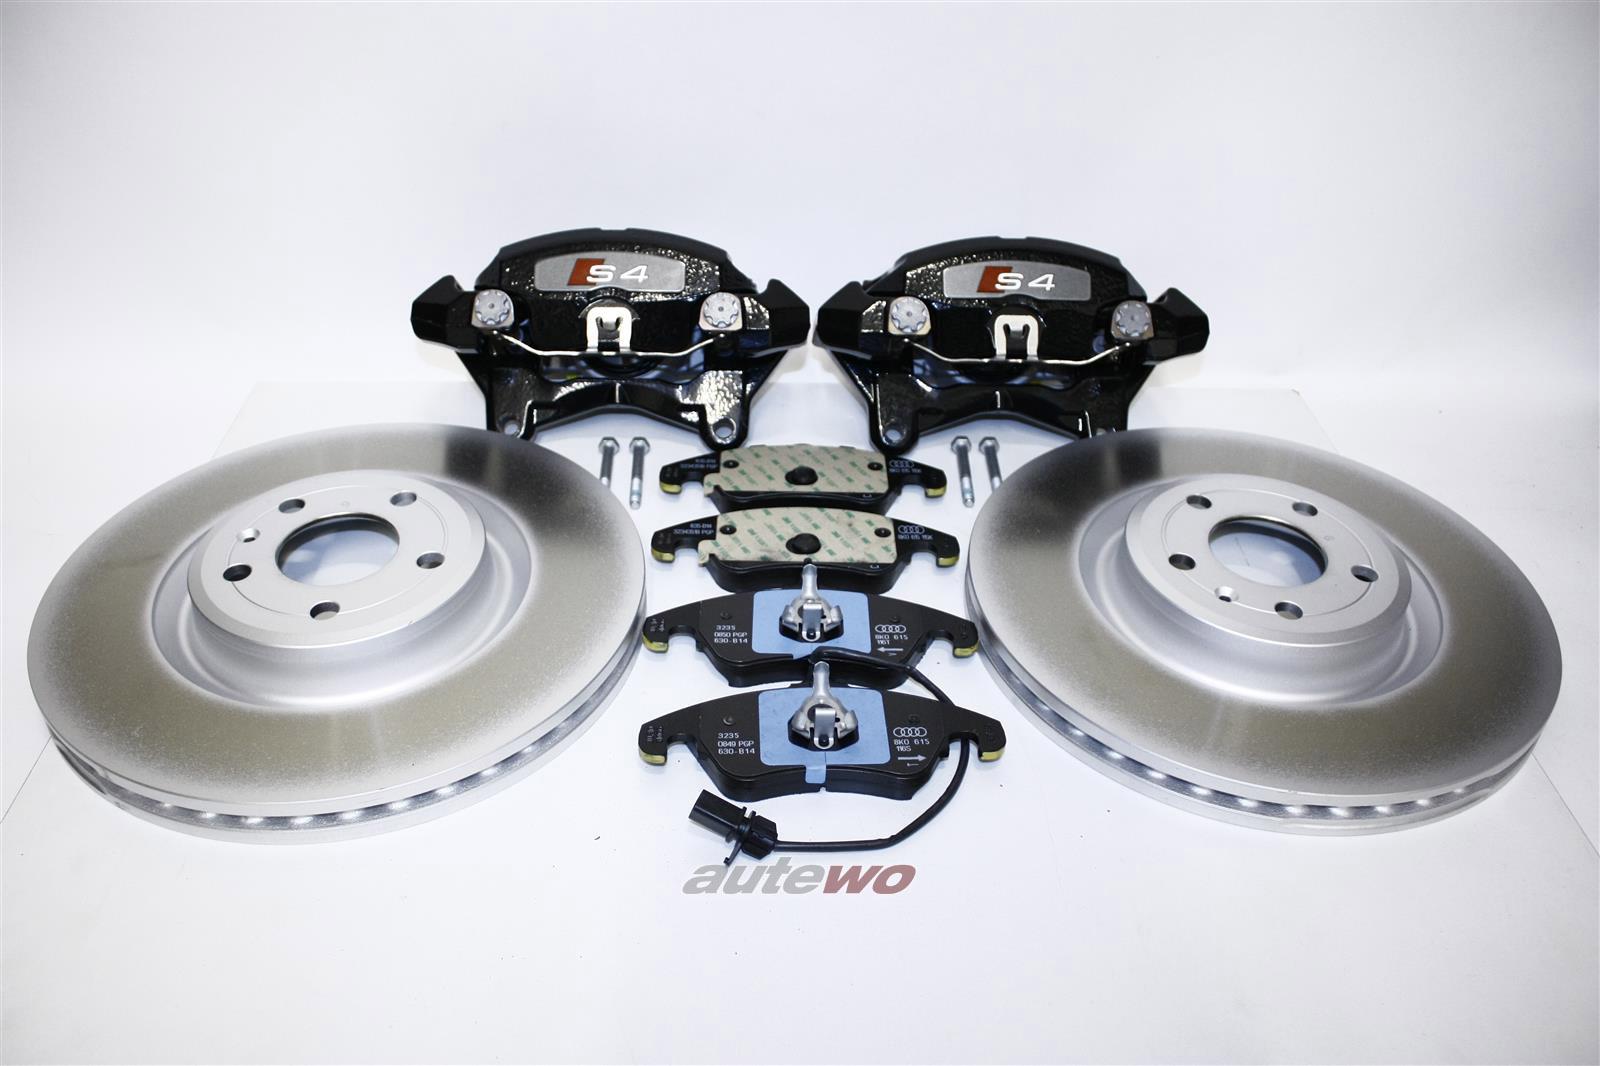 8K0615123G/124G/8T0615123C/124C  NEU Audi S4 8K/S5 8T kompl. Bremsanlage 345x30